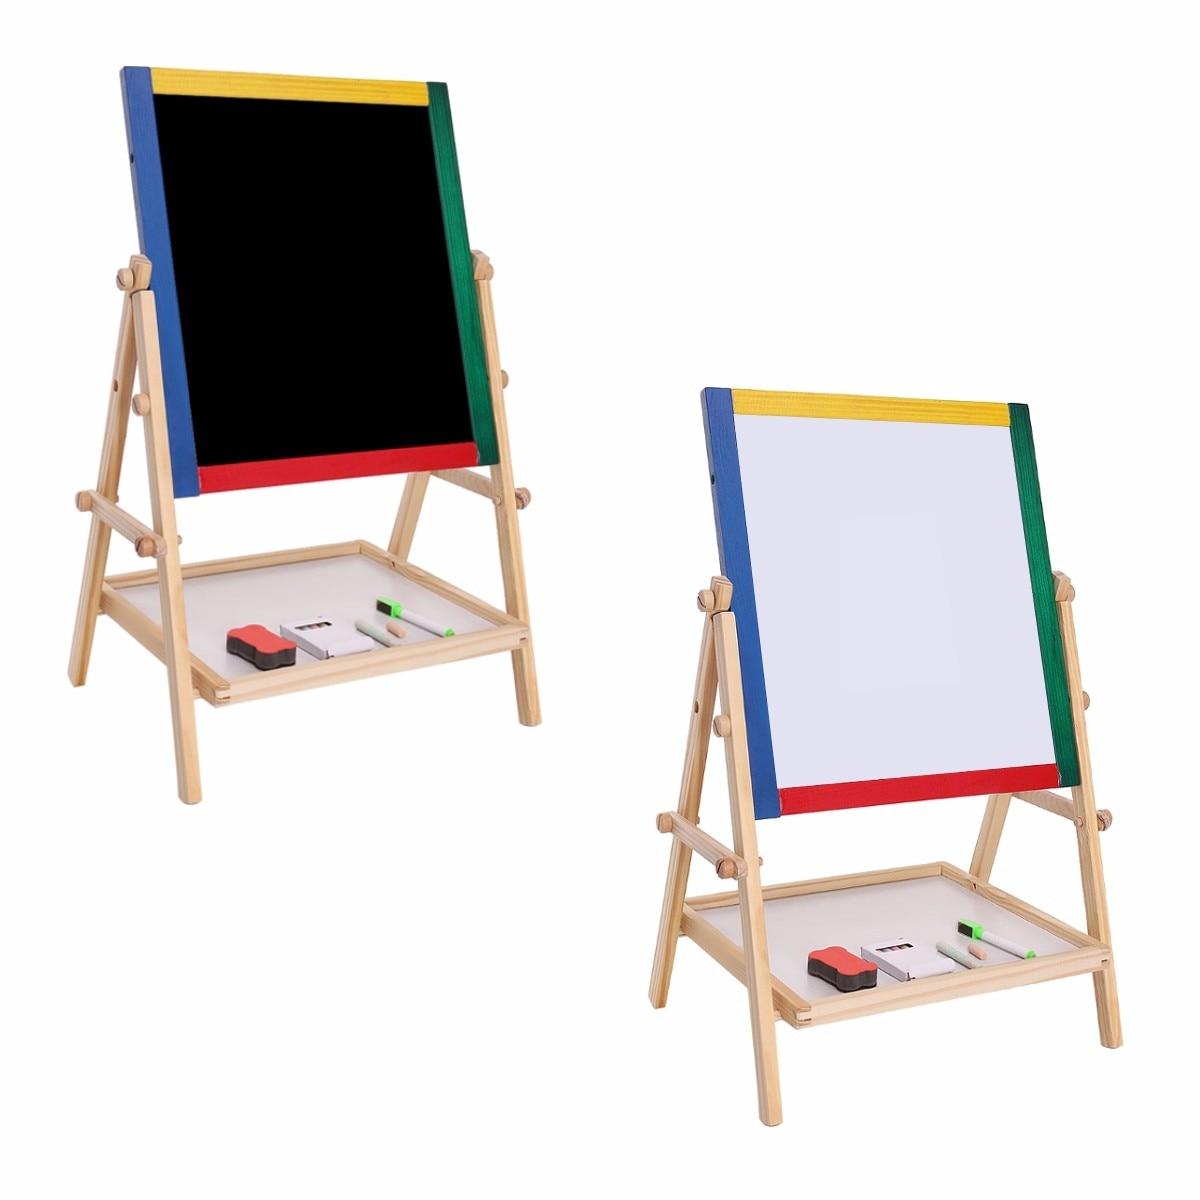 Drawing Board Educational Toy For Children Adjustable Children Kids 2 In 1 Black / White Wooden Easel Chalk